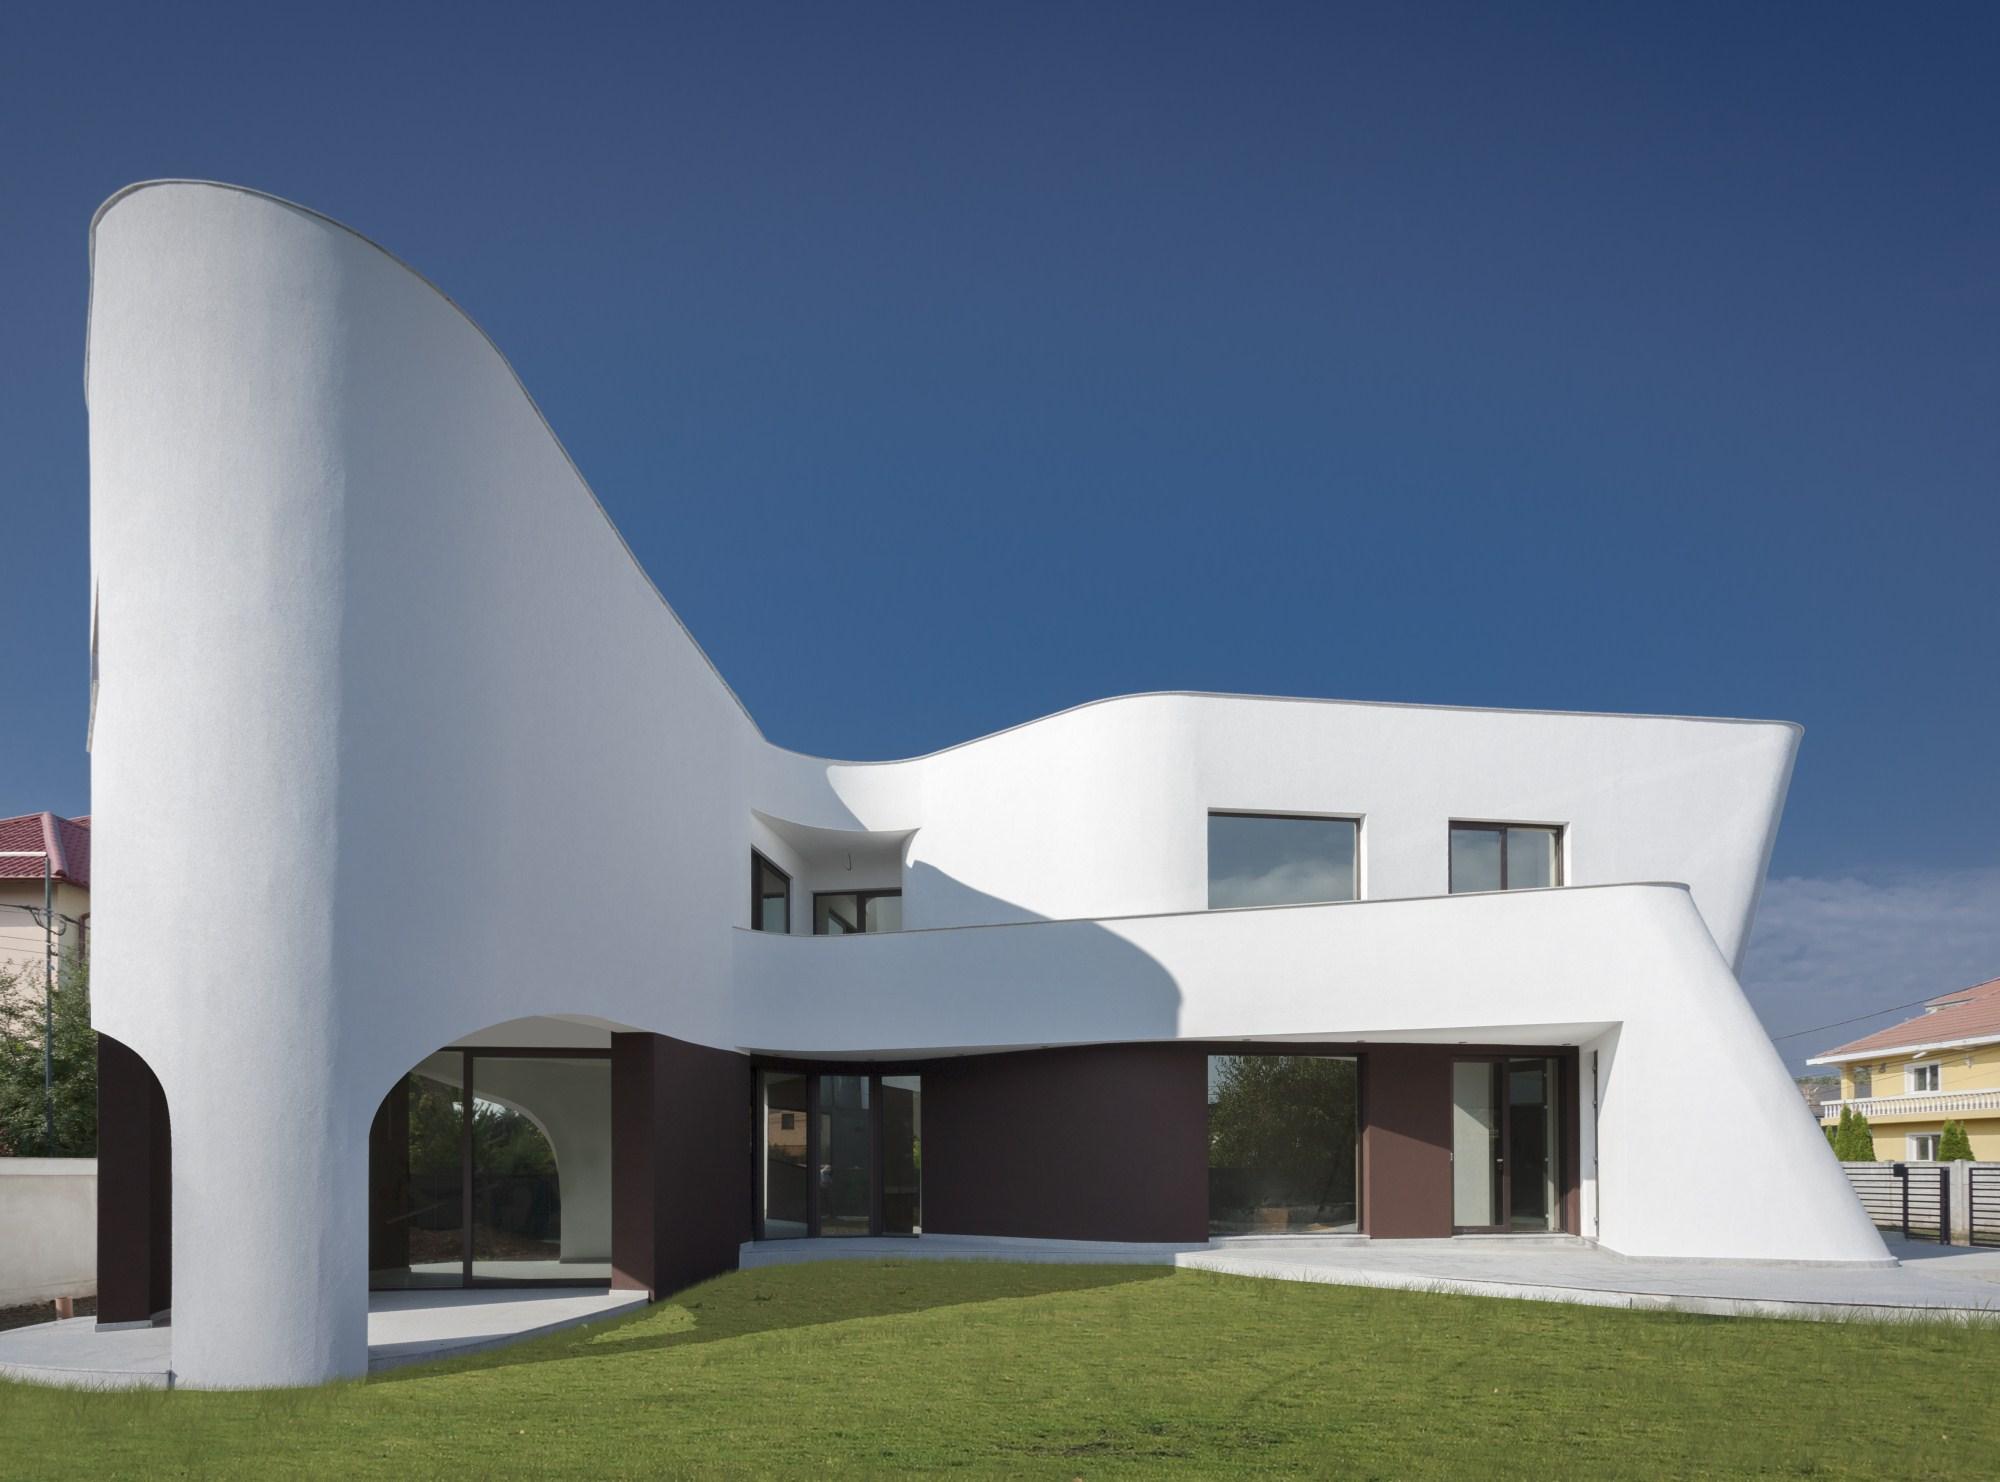 https://nbc-arhitect.ro/wp-content/uploads/2020/10/NBC-Arhitect-_-residences-_-Wing-House-_-Romania-_-exterior-view-_-master-photo_1.jpg